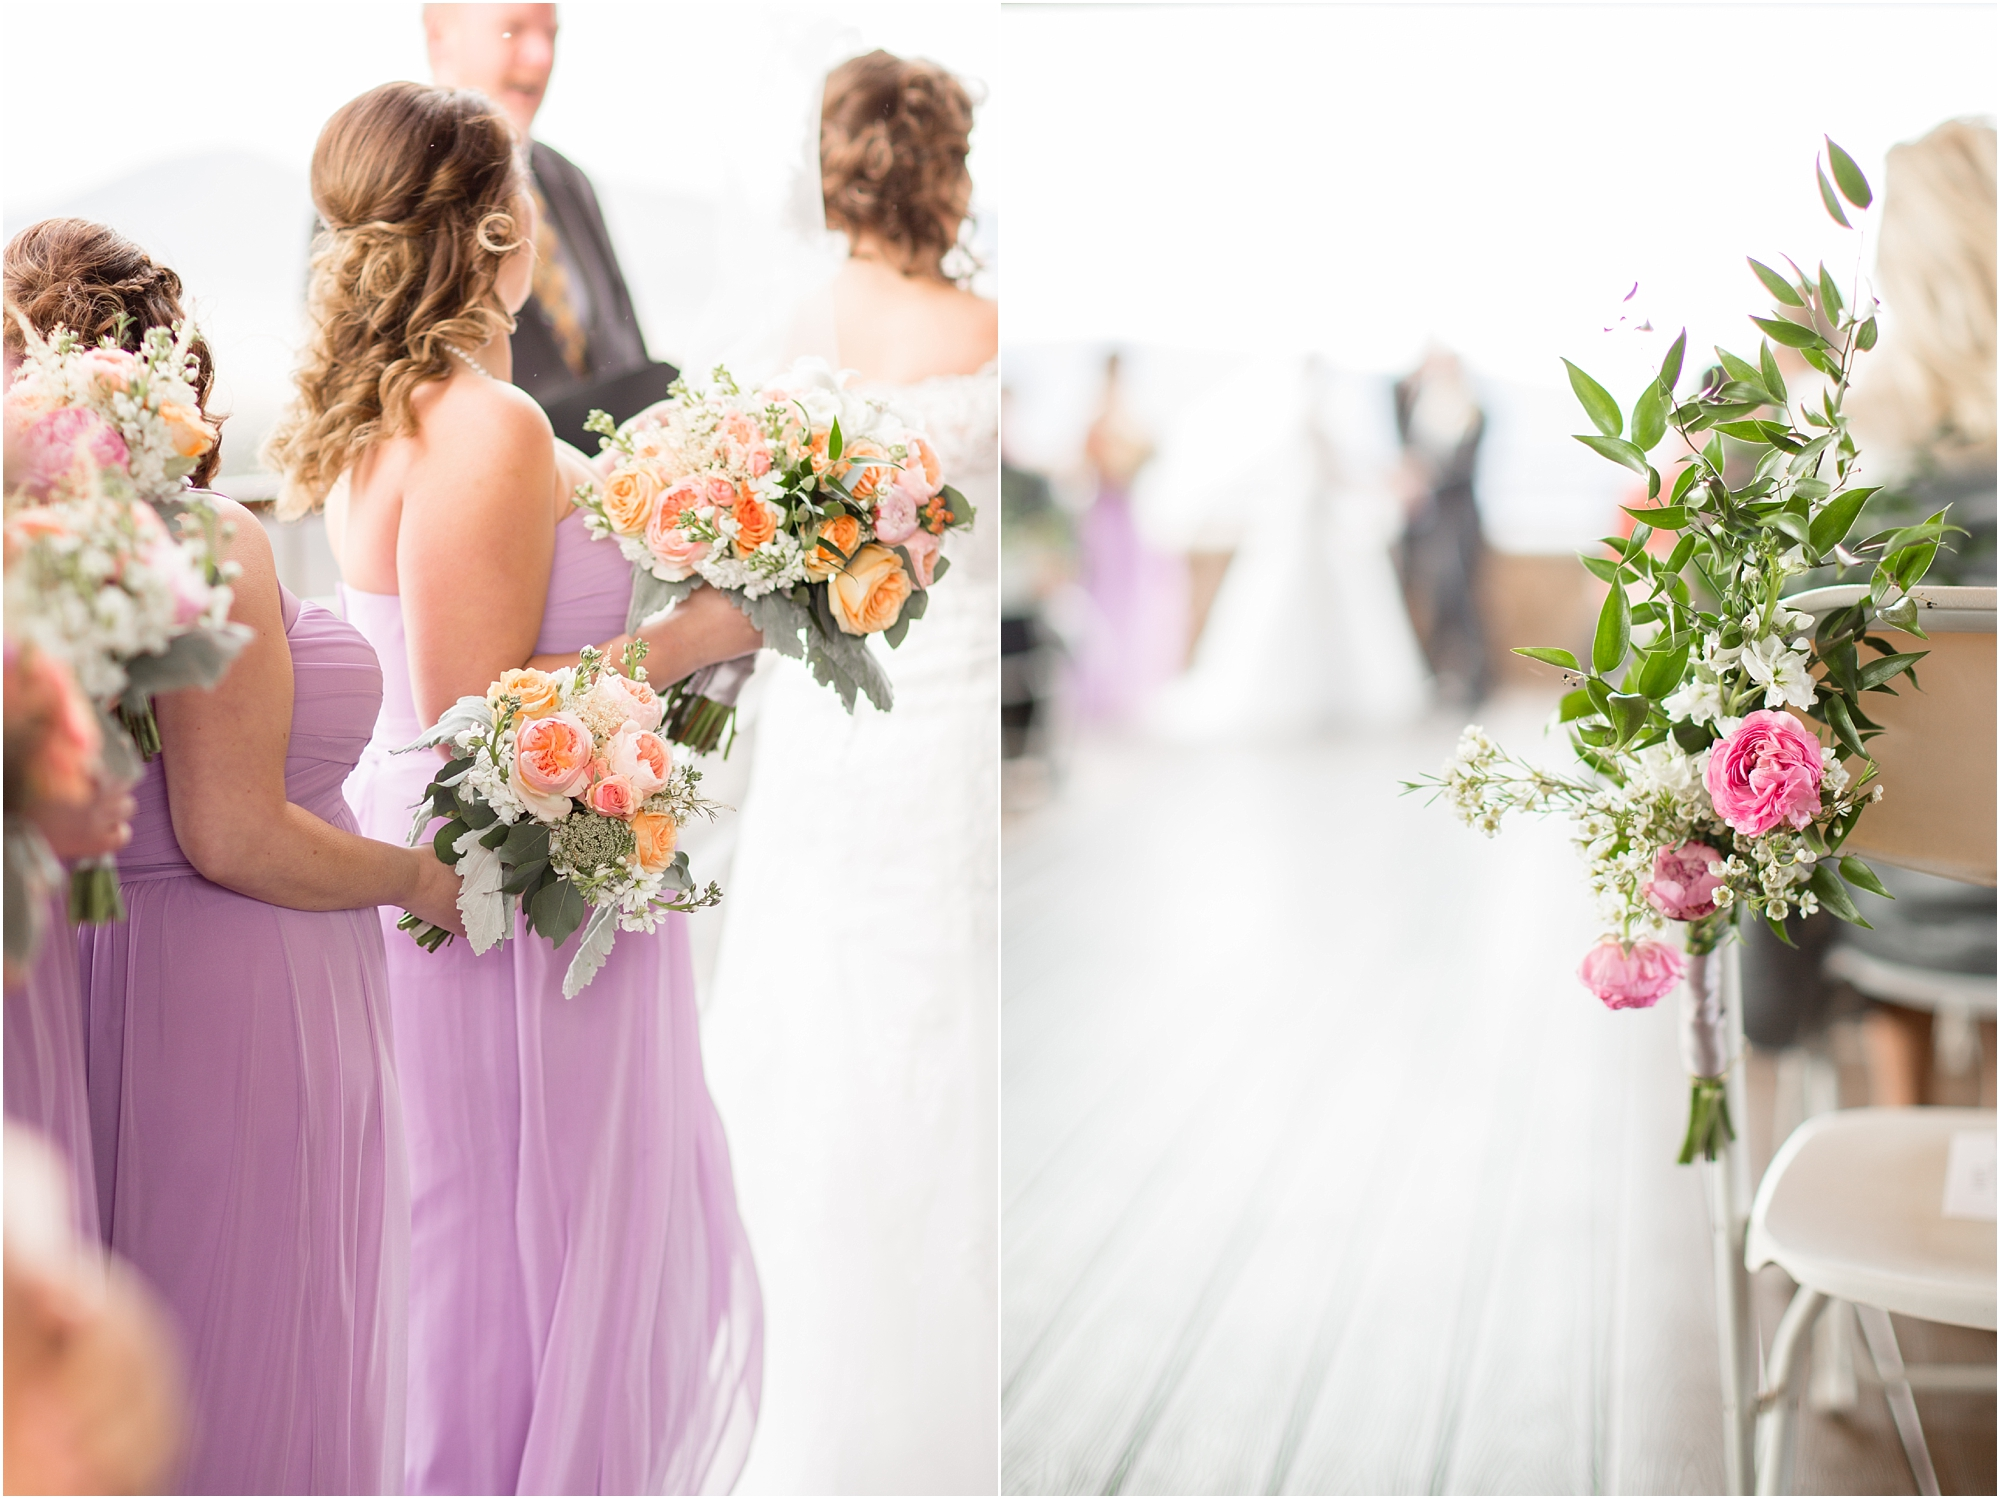 Simpson 4-Ceremony-629_anna grace photography virginia wedding photographer irvine estate photo.jpg